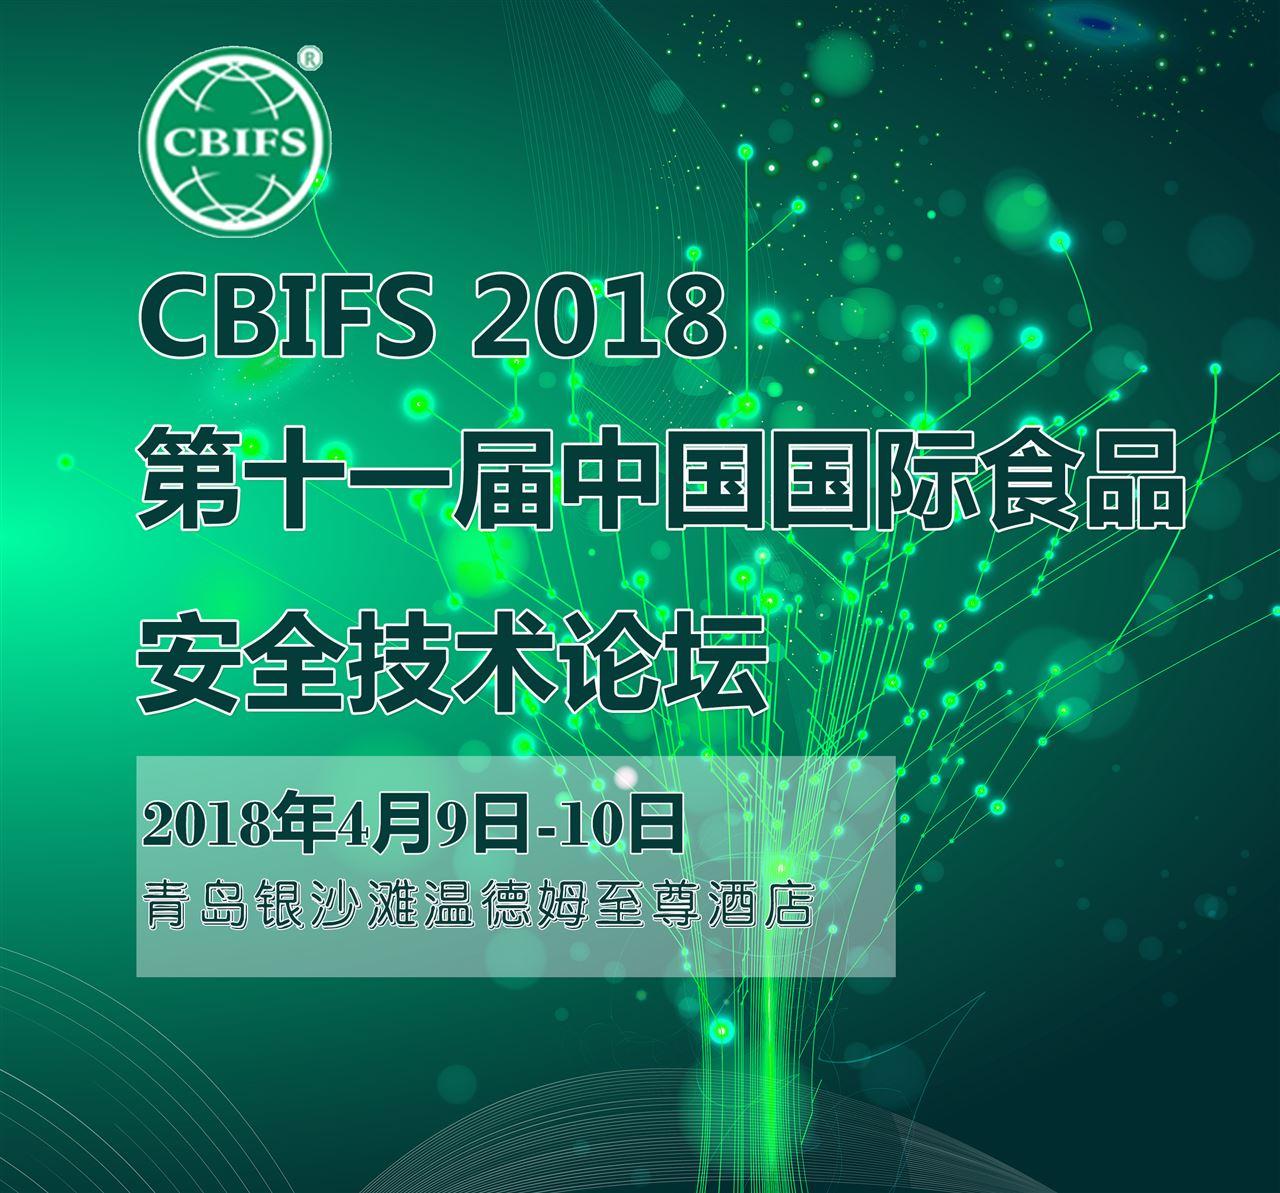 CBIFS 2018第十一屆中國國際食品安全技術論壇盛大開幕